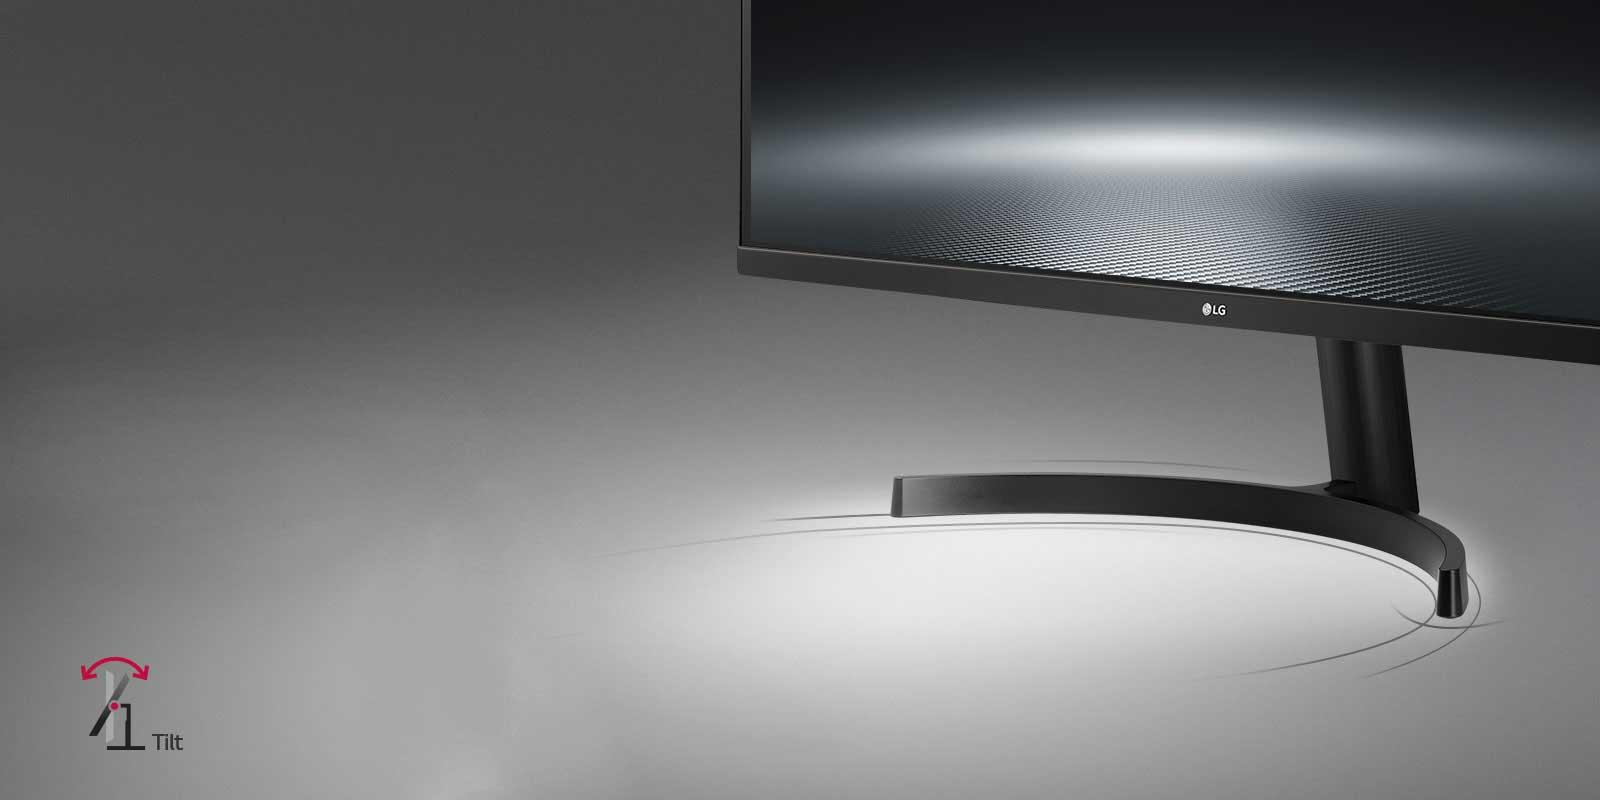 F9_MNT-34WL500-Feature-10-Edge-Arc-Design-Desktop-v1